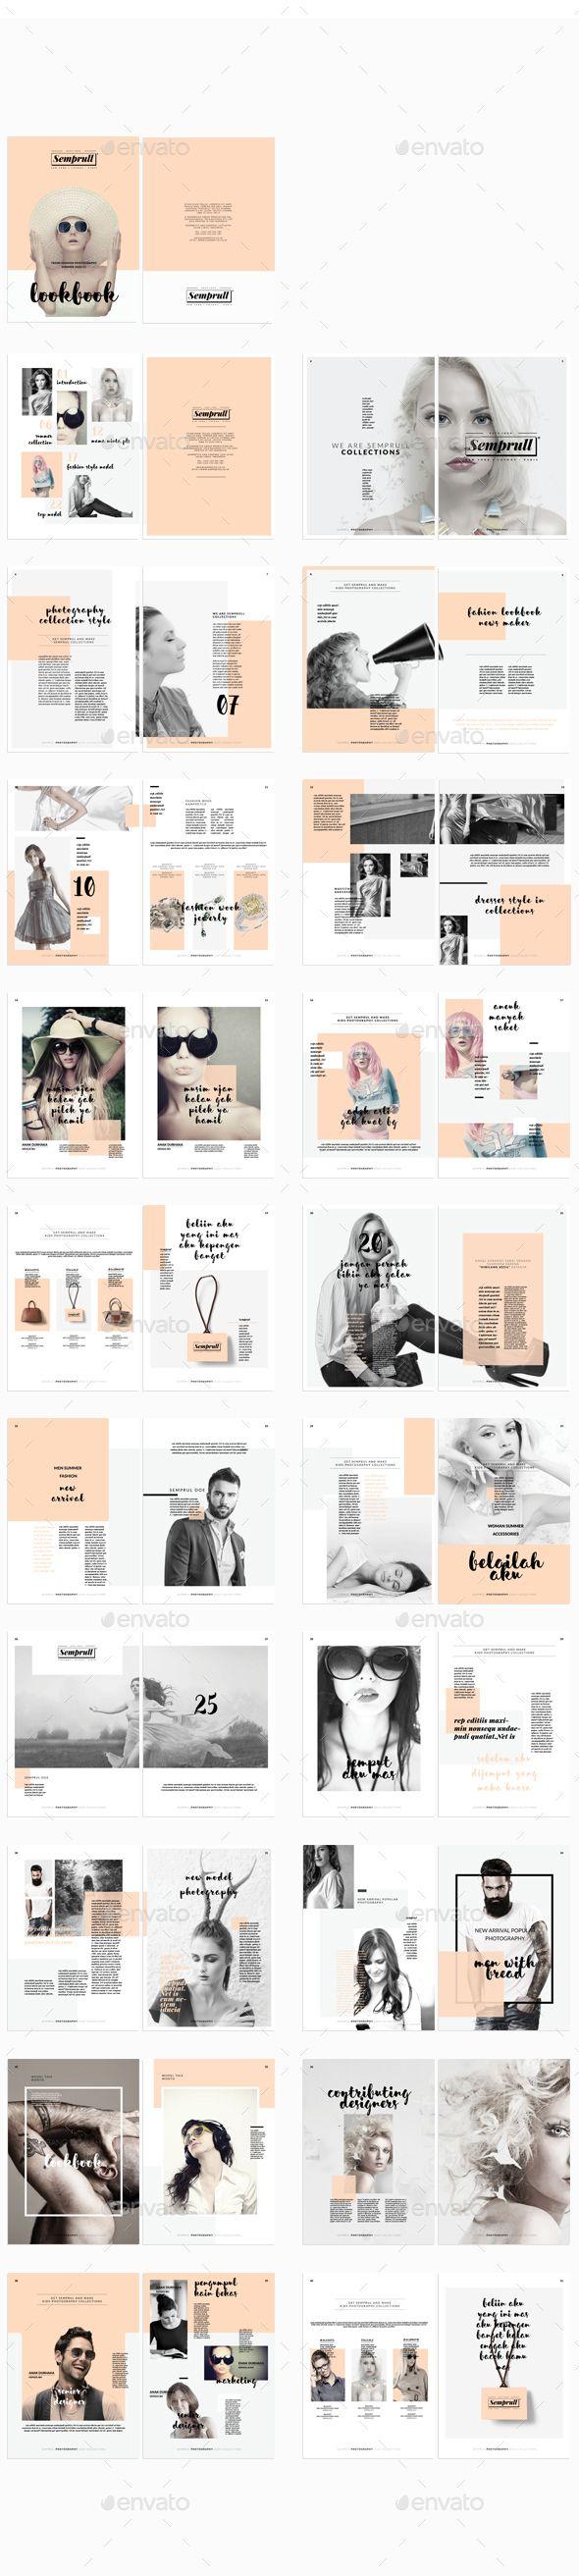 Lookbook Template InDesign INDD #design Download: http://graphicriver.net/item/lookbook/14095999?ref=ksioks